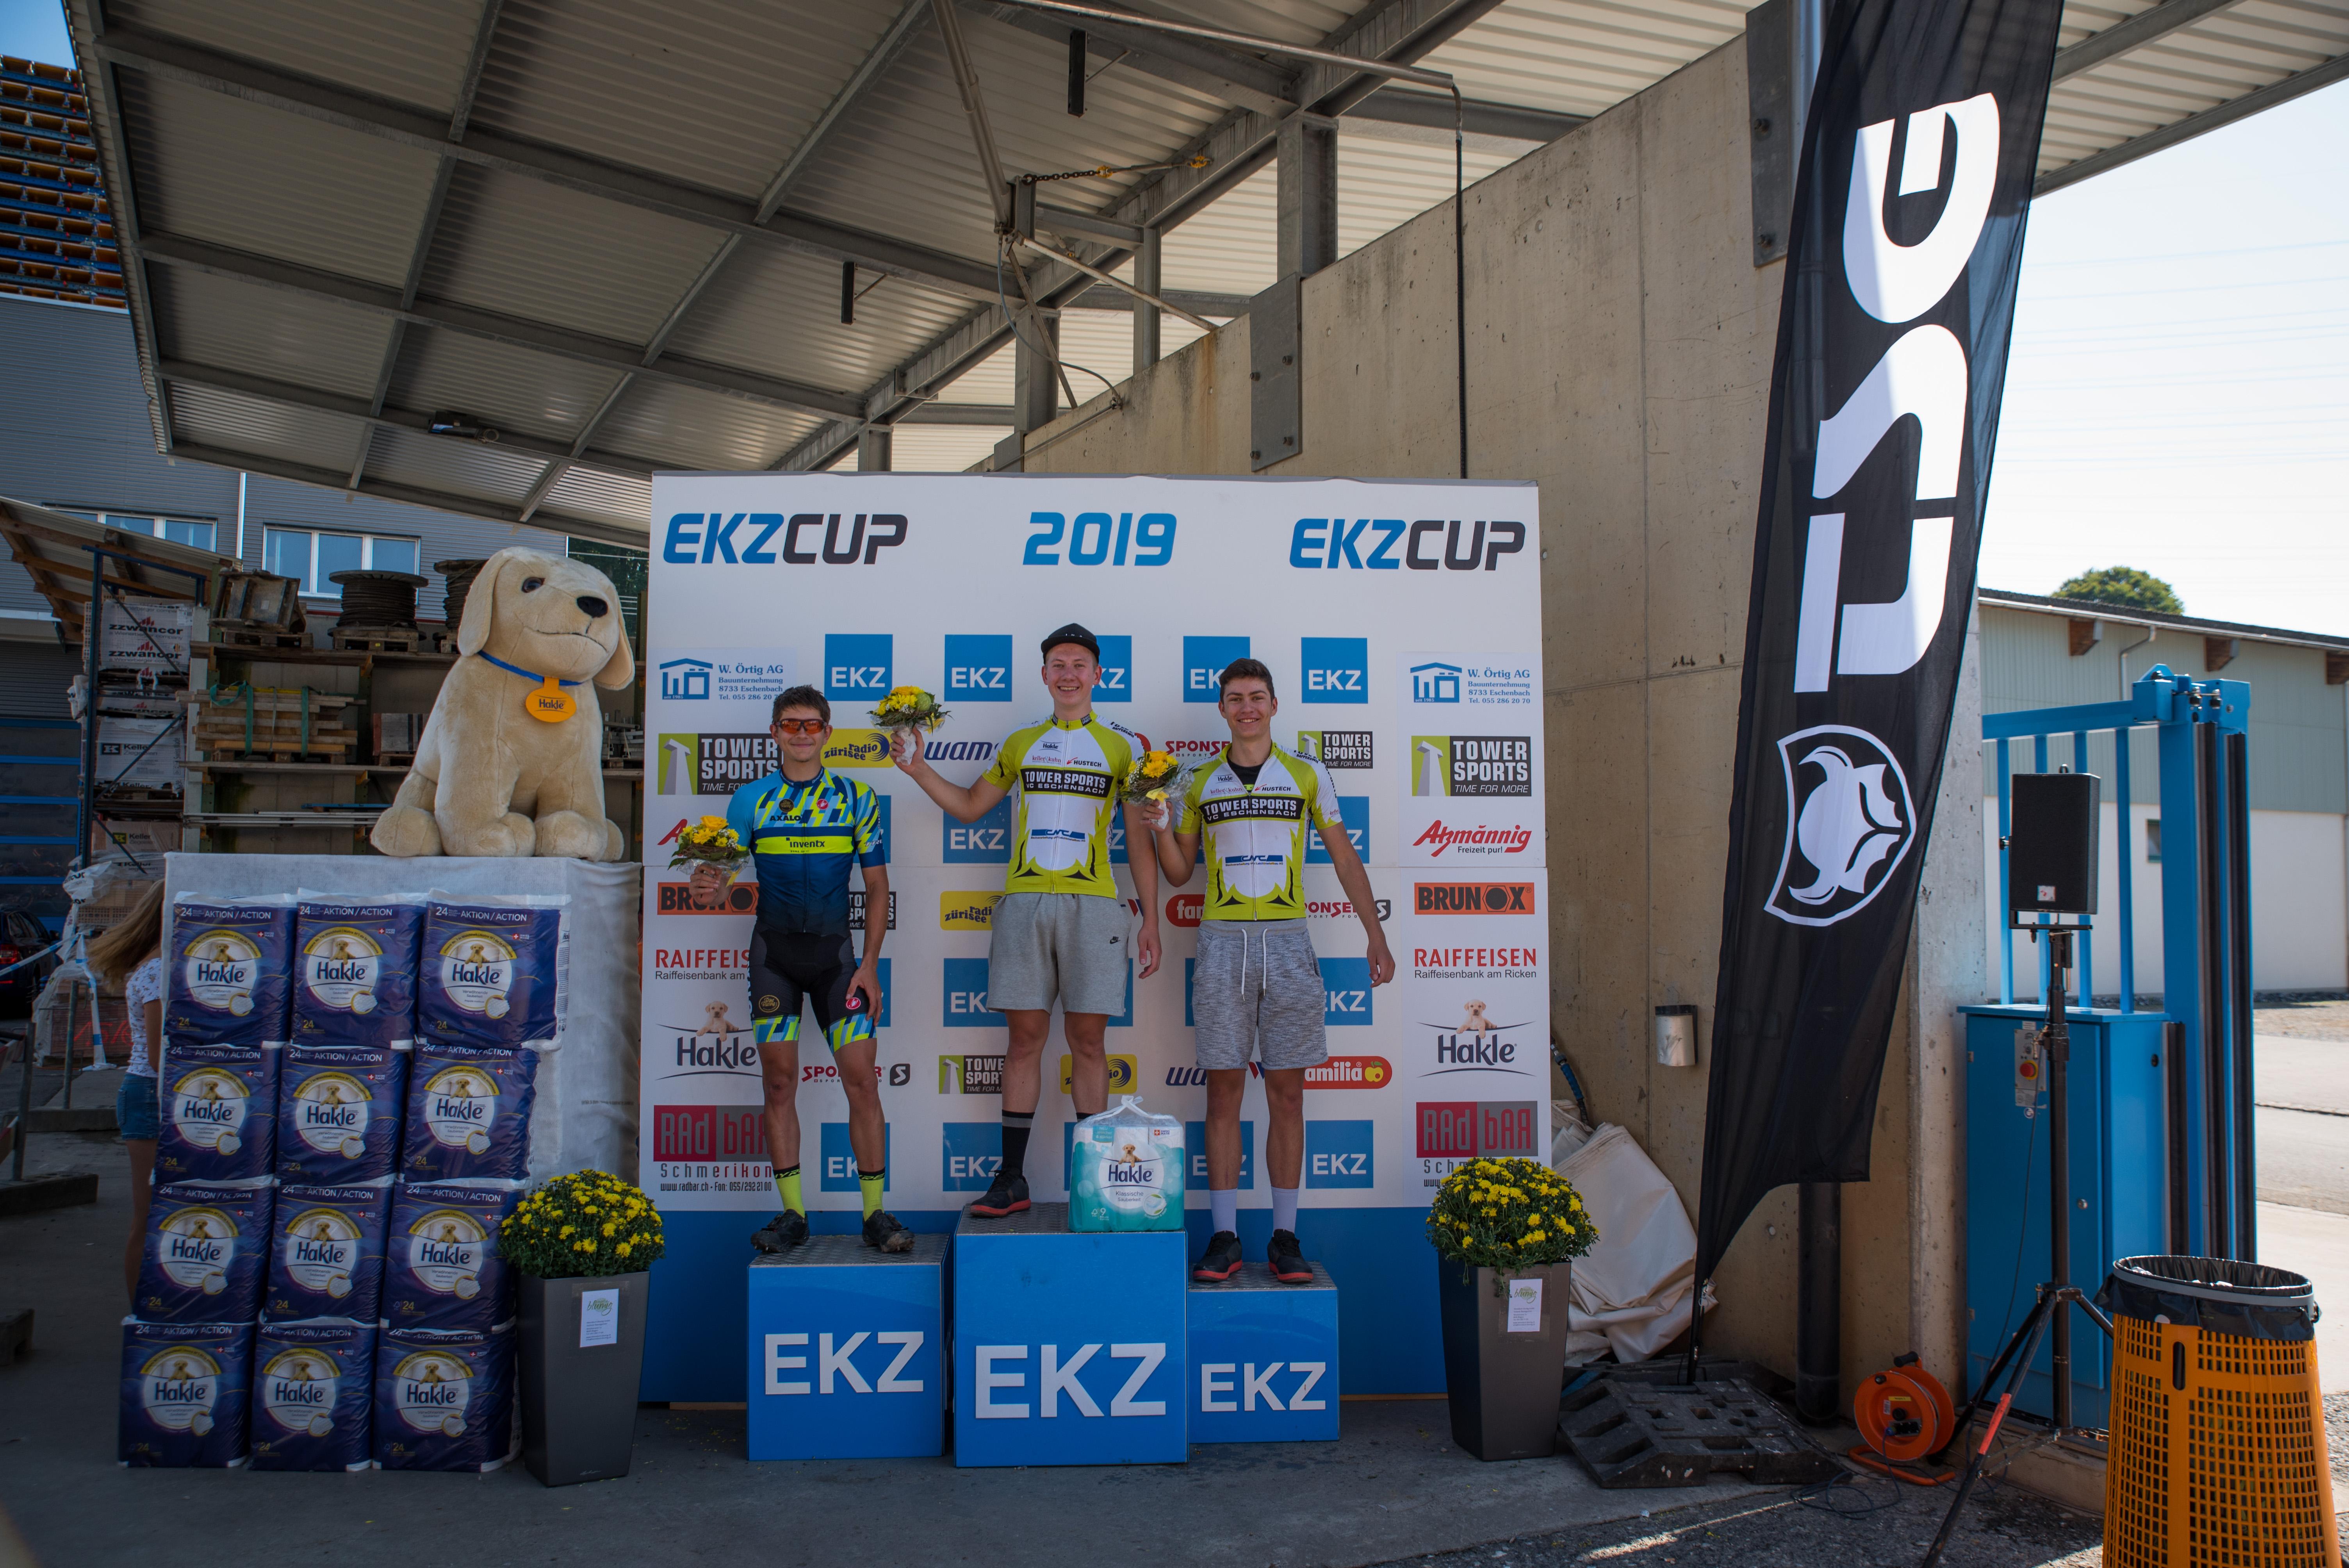 2019.08.25 EKZ Cup Eschenbach Podest